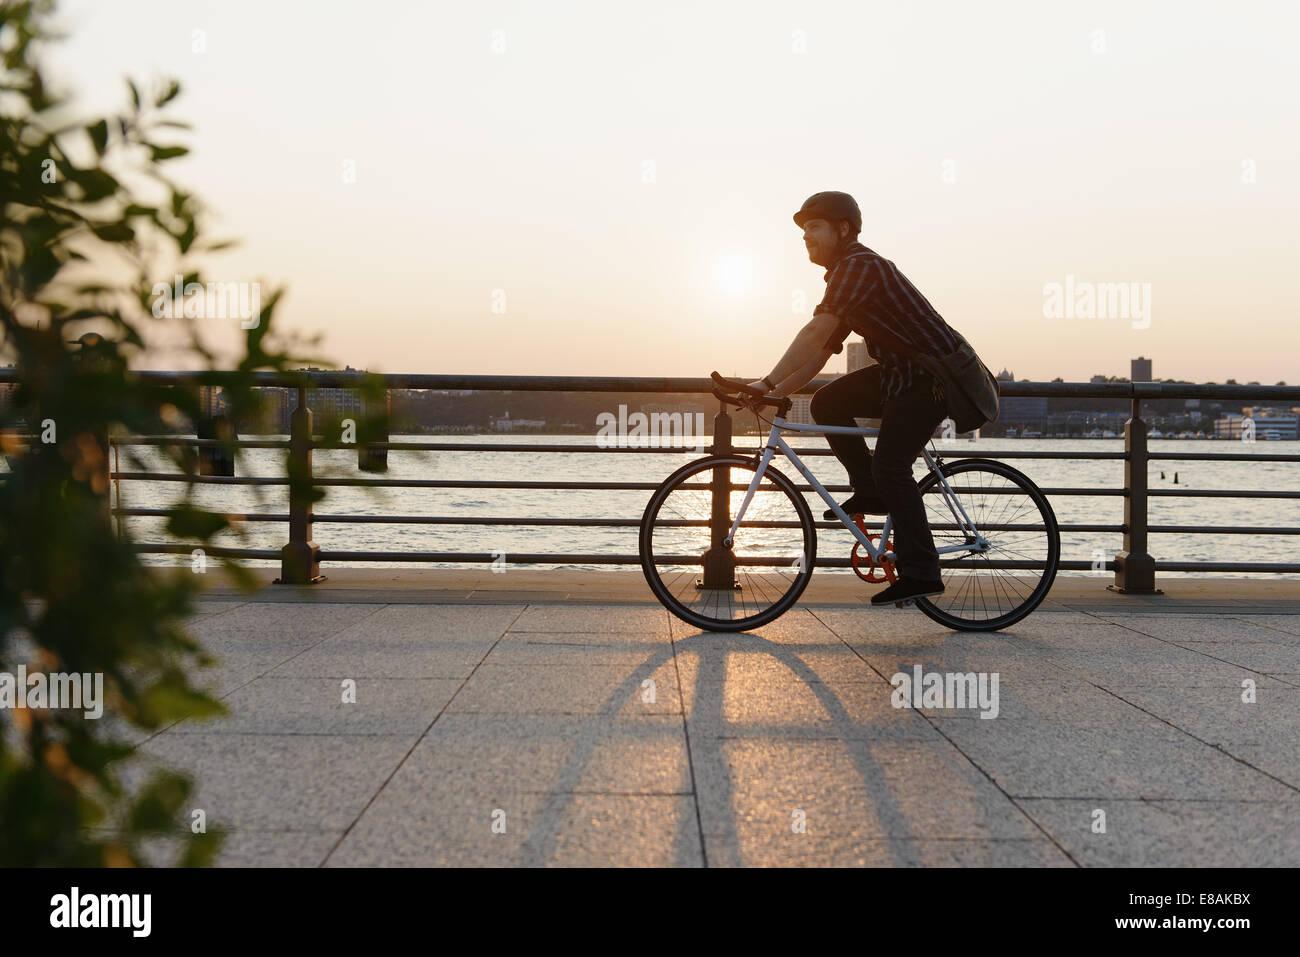 Messenger masculino en bicicleta a lo largo de city riverside Imagen De Stock